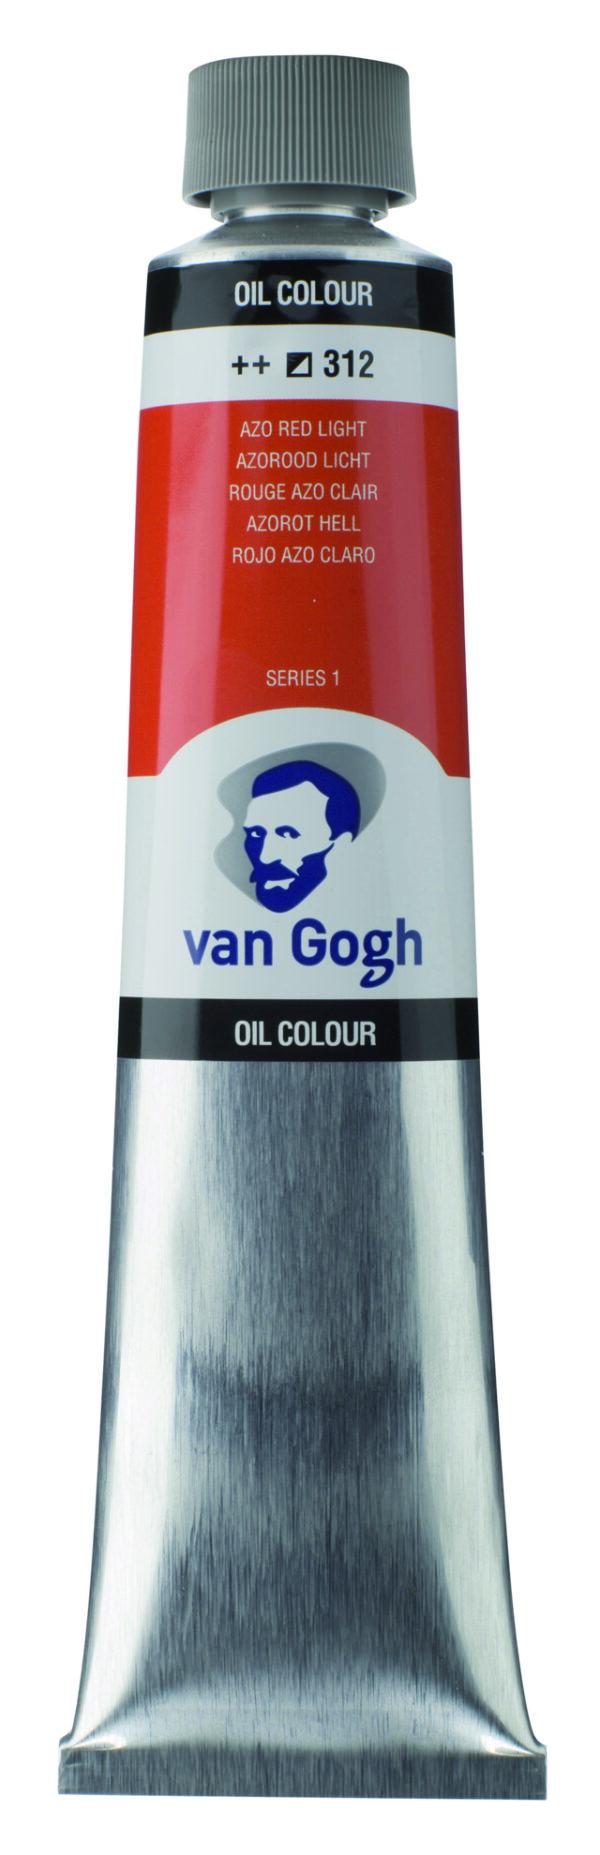 Van Gogh 312 Azo red Light - 200 ml